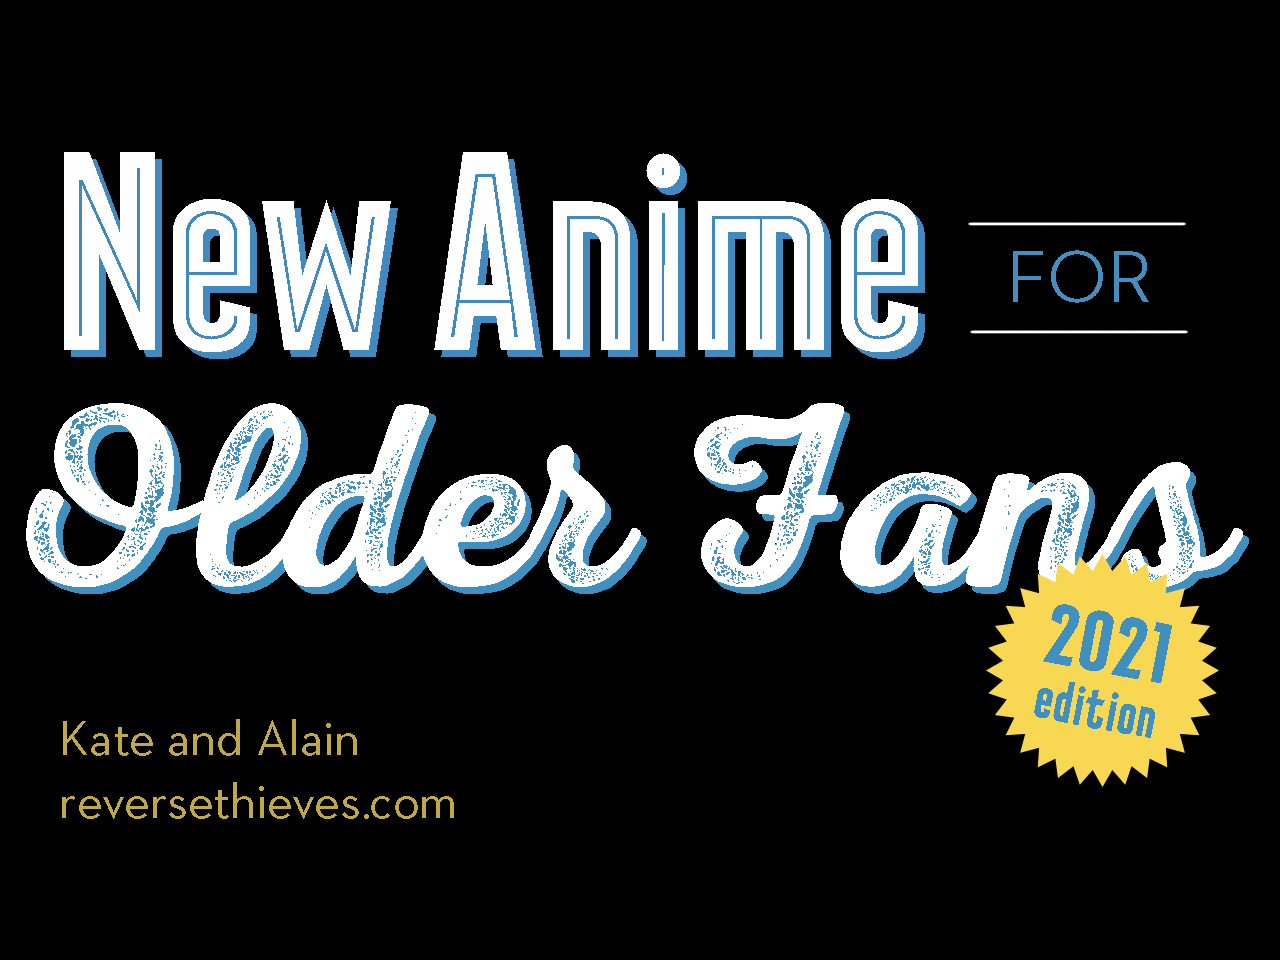 Featured image for New Anime for Older Fans Returns to Otakon 2021!